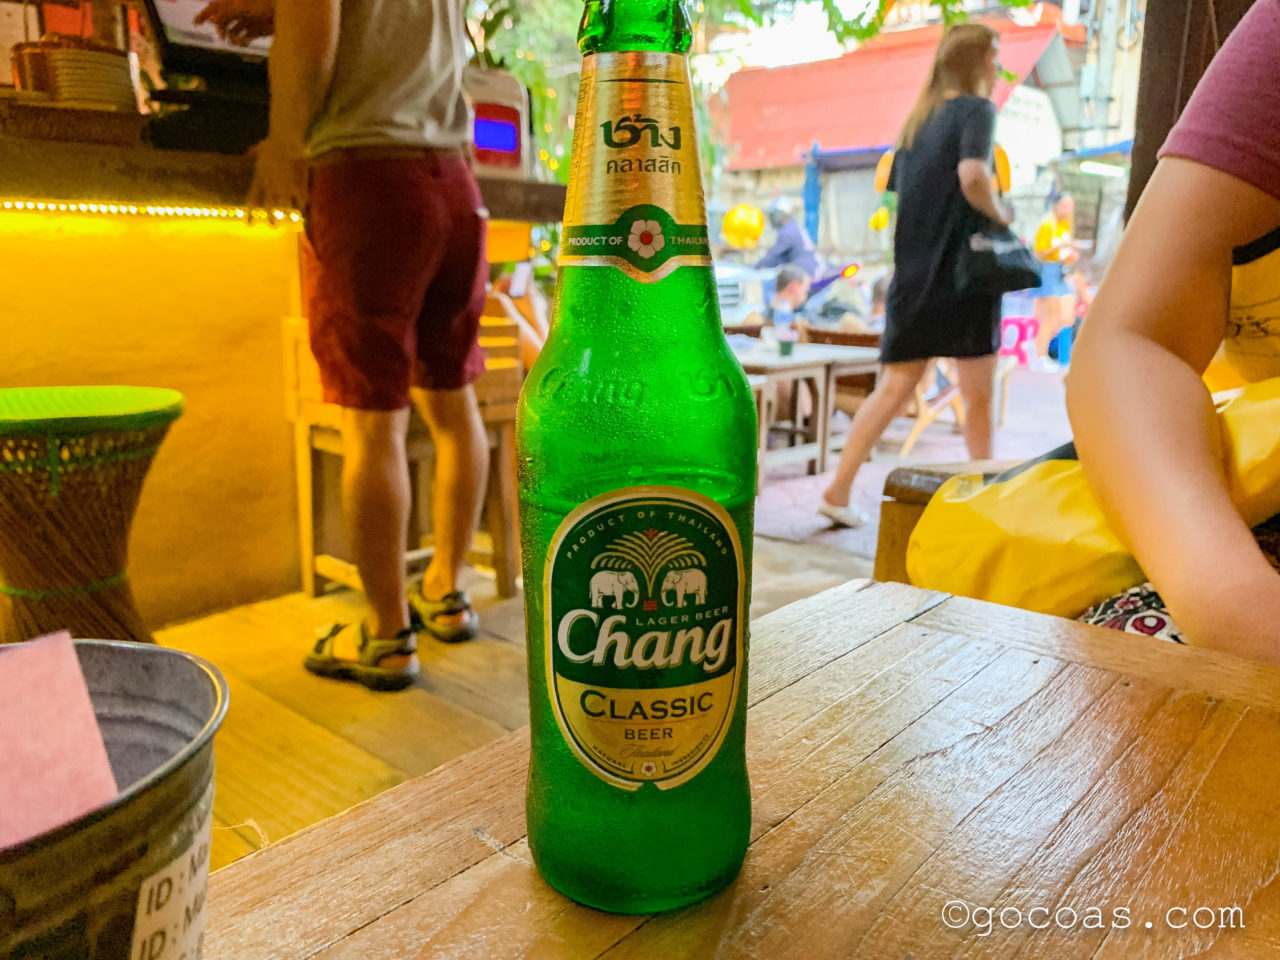 Madame Musurで飲んだChangビール